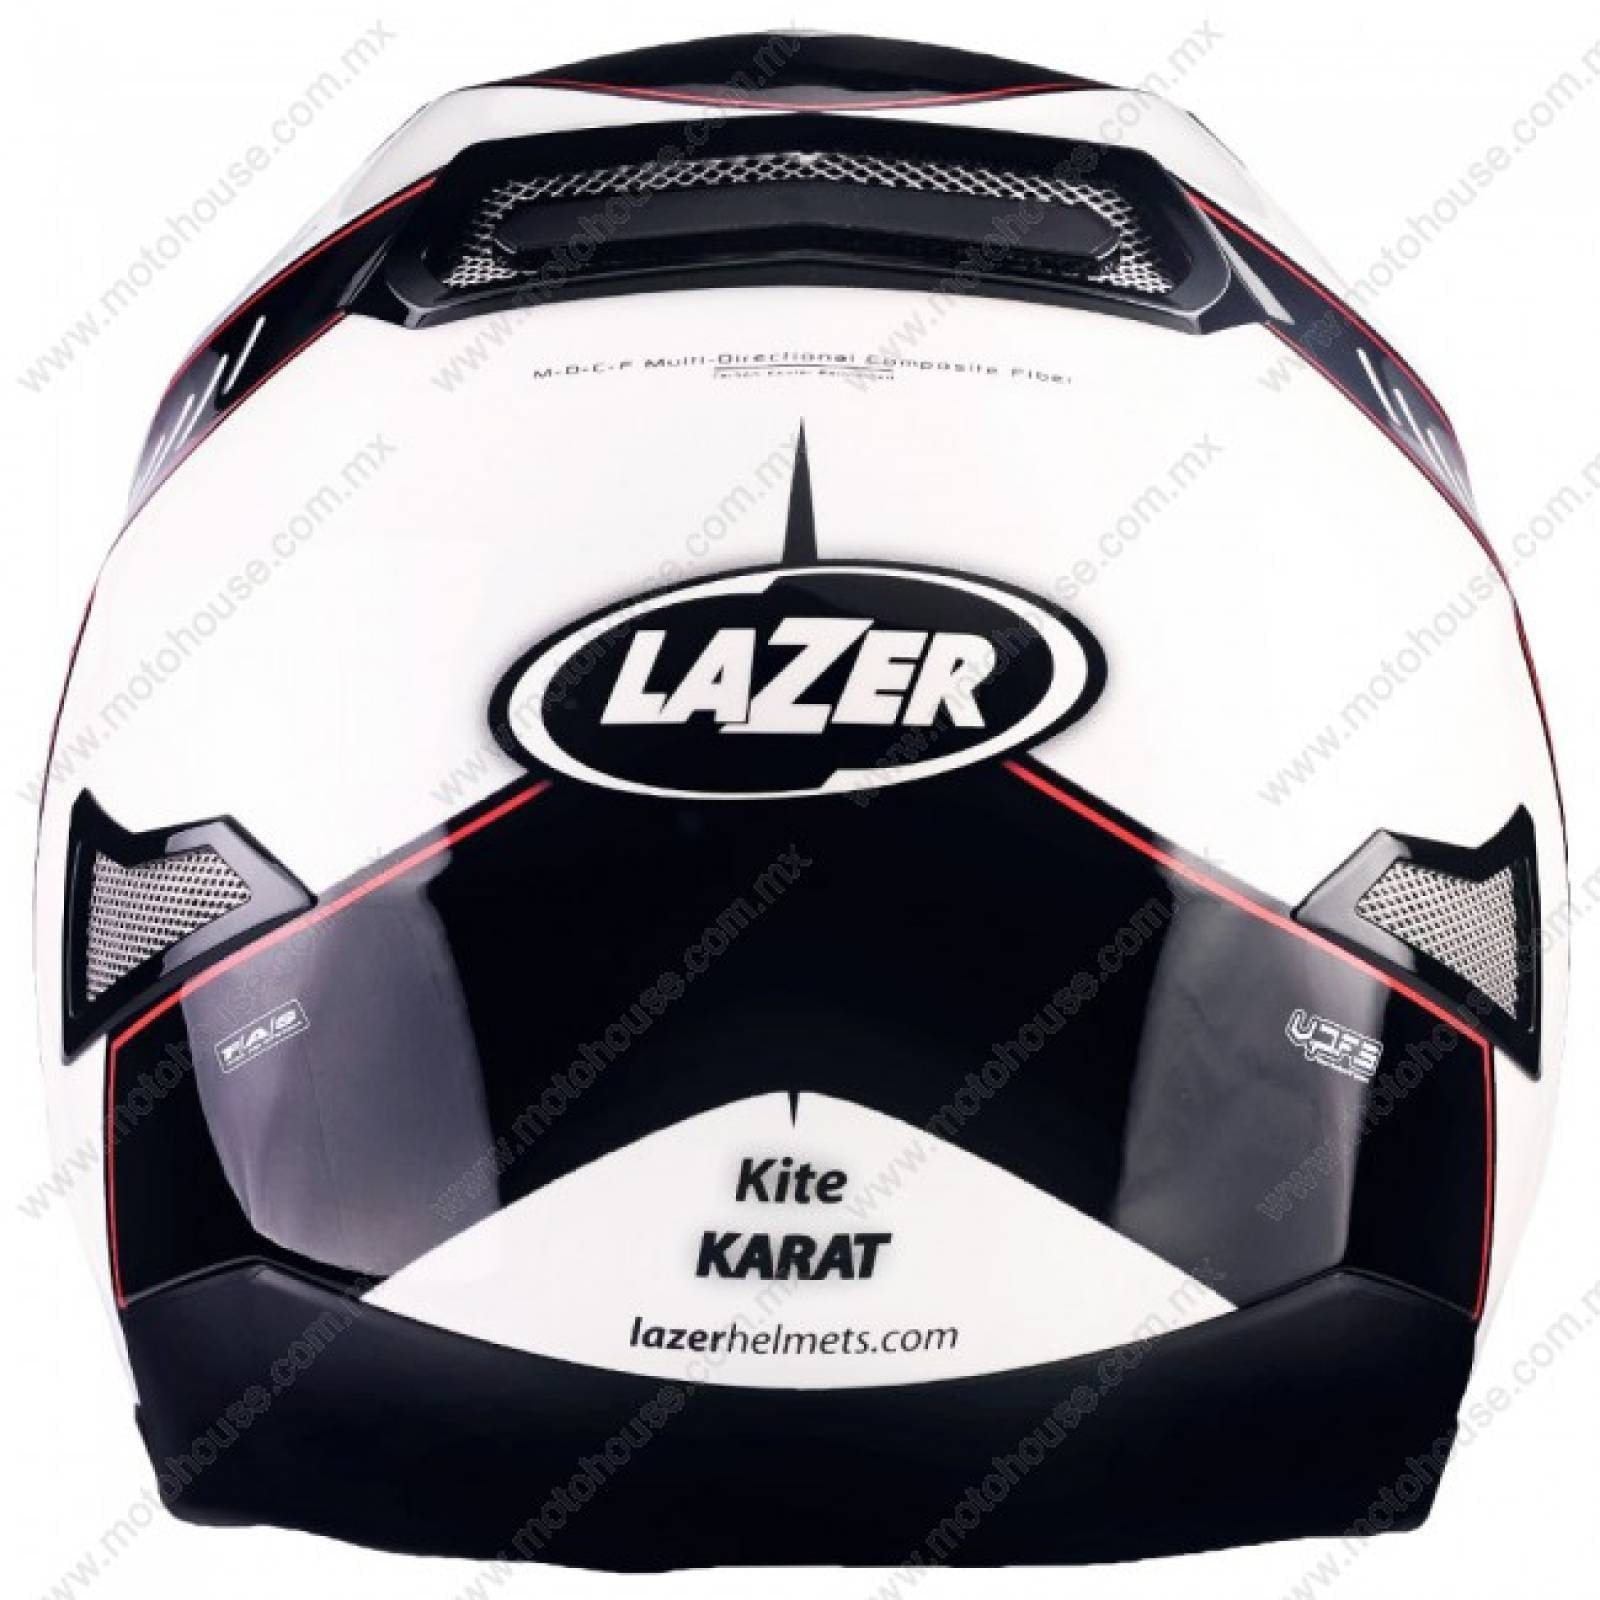 CASCO 2XL KITE KARAT PURE GLASS BLANCO/NEGRO LAZER